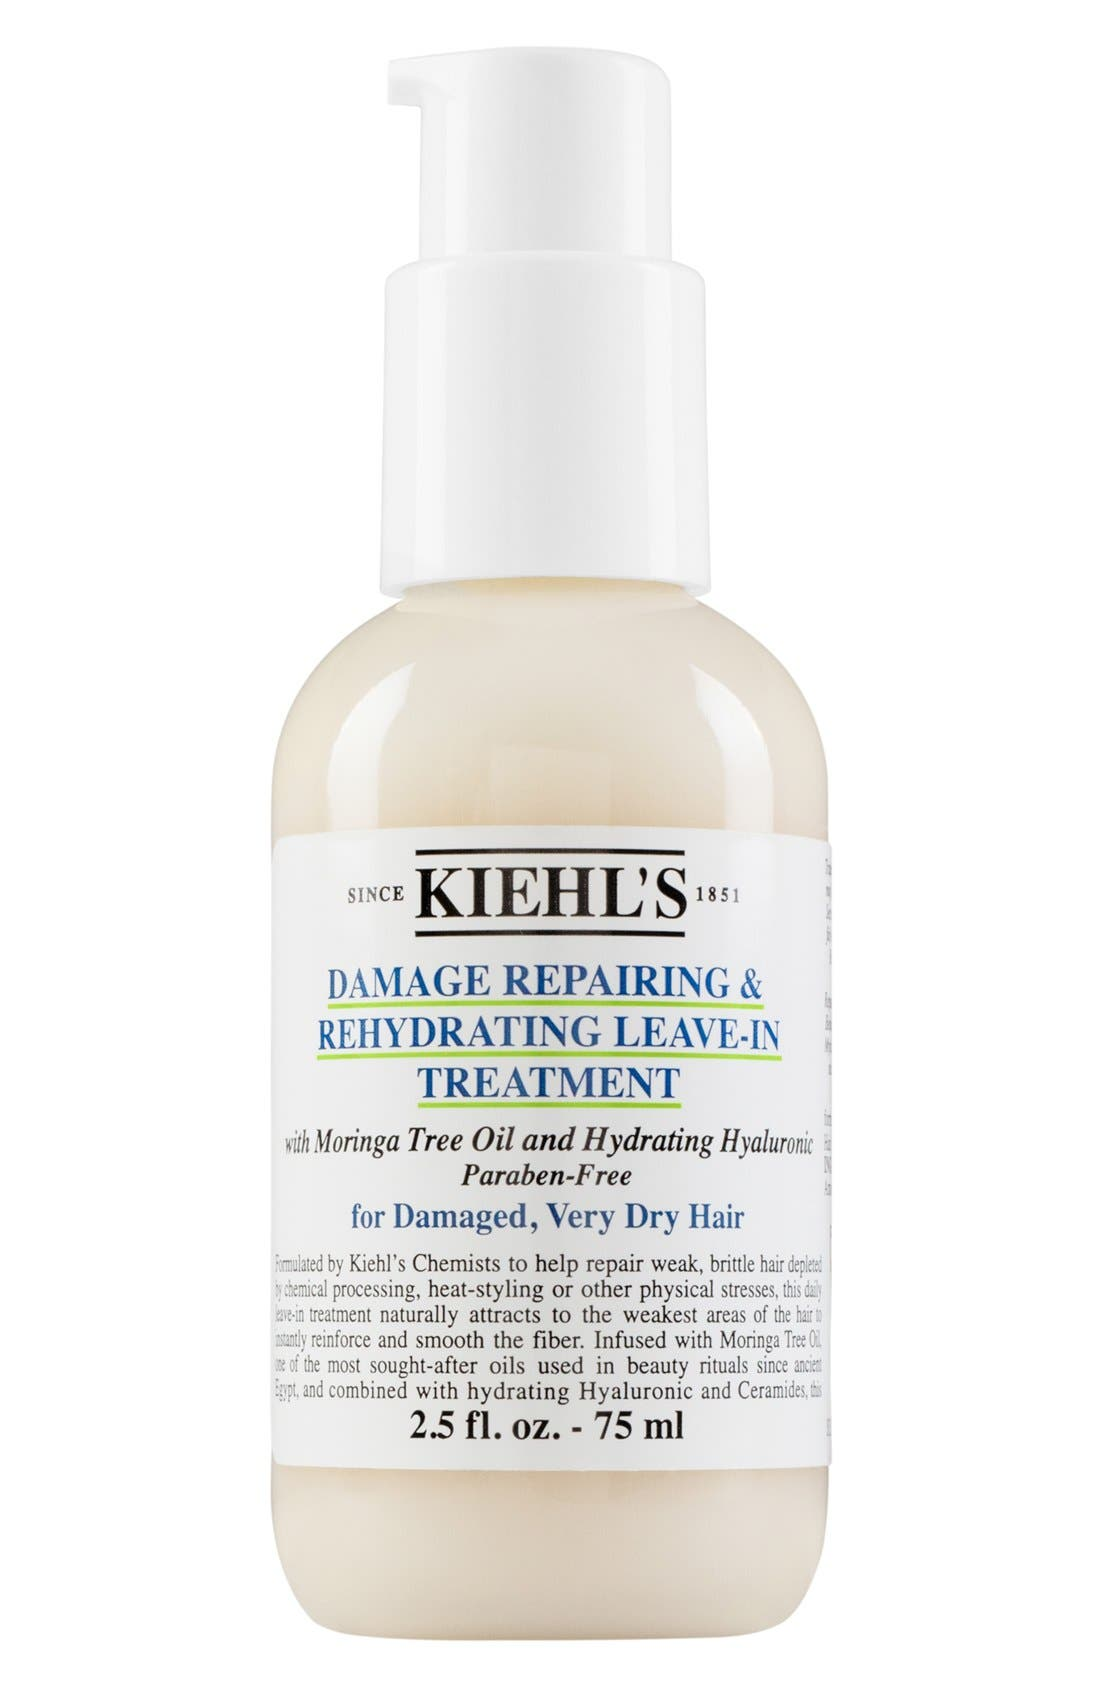 1851 Damage Repairing & Rehydrating Leave-In Hair Treatment